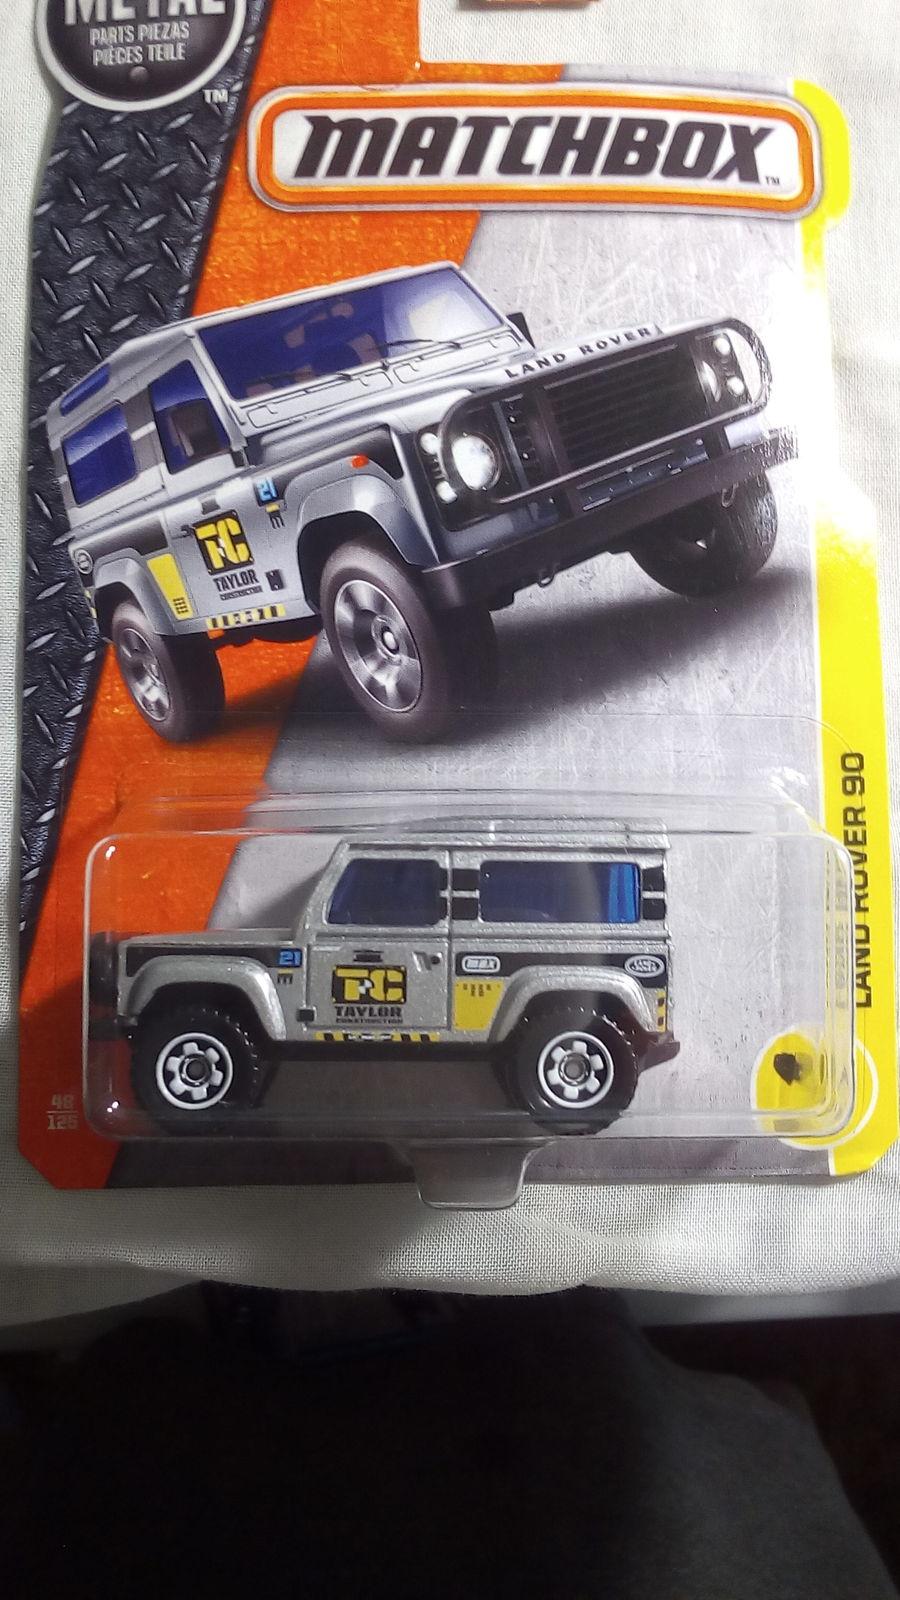 730 x Pins LEGO Technic 2780... 11214 18651 Achs Kreuz Verbinder Pin 3L